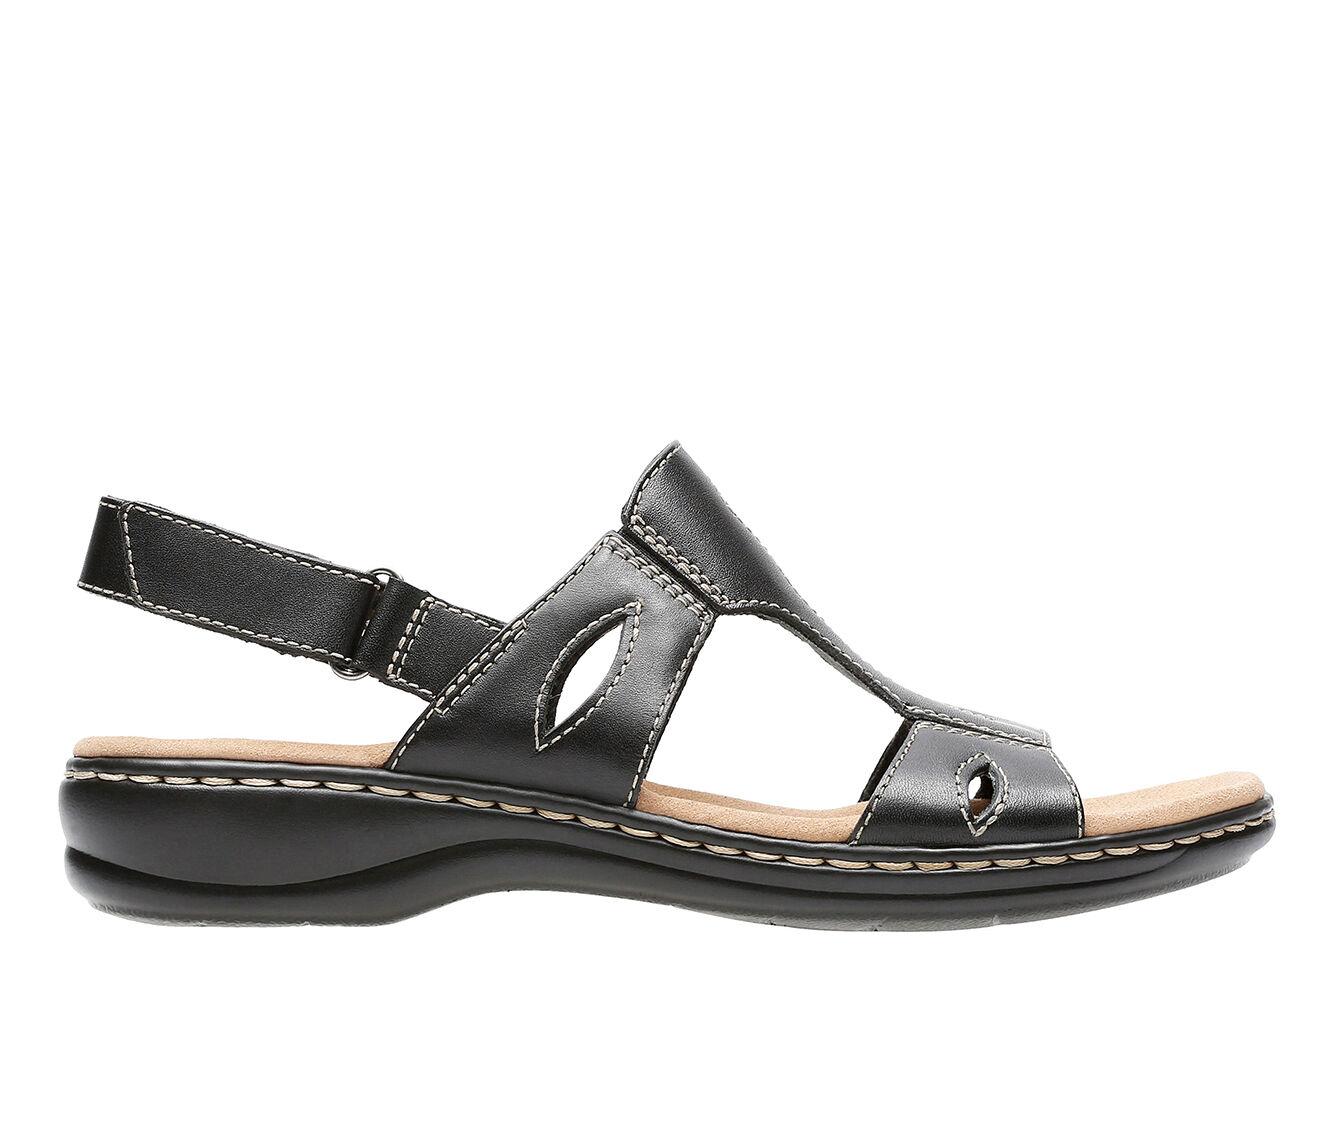 Women's Clarks Leisa Lakelyn Sandals Black Leather